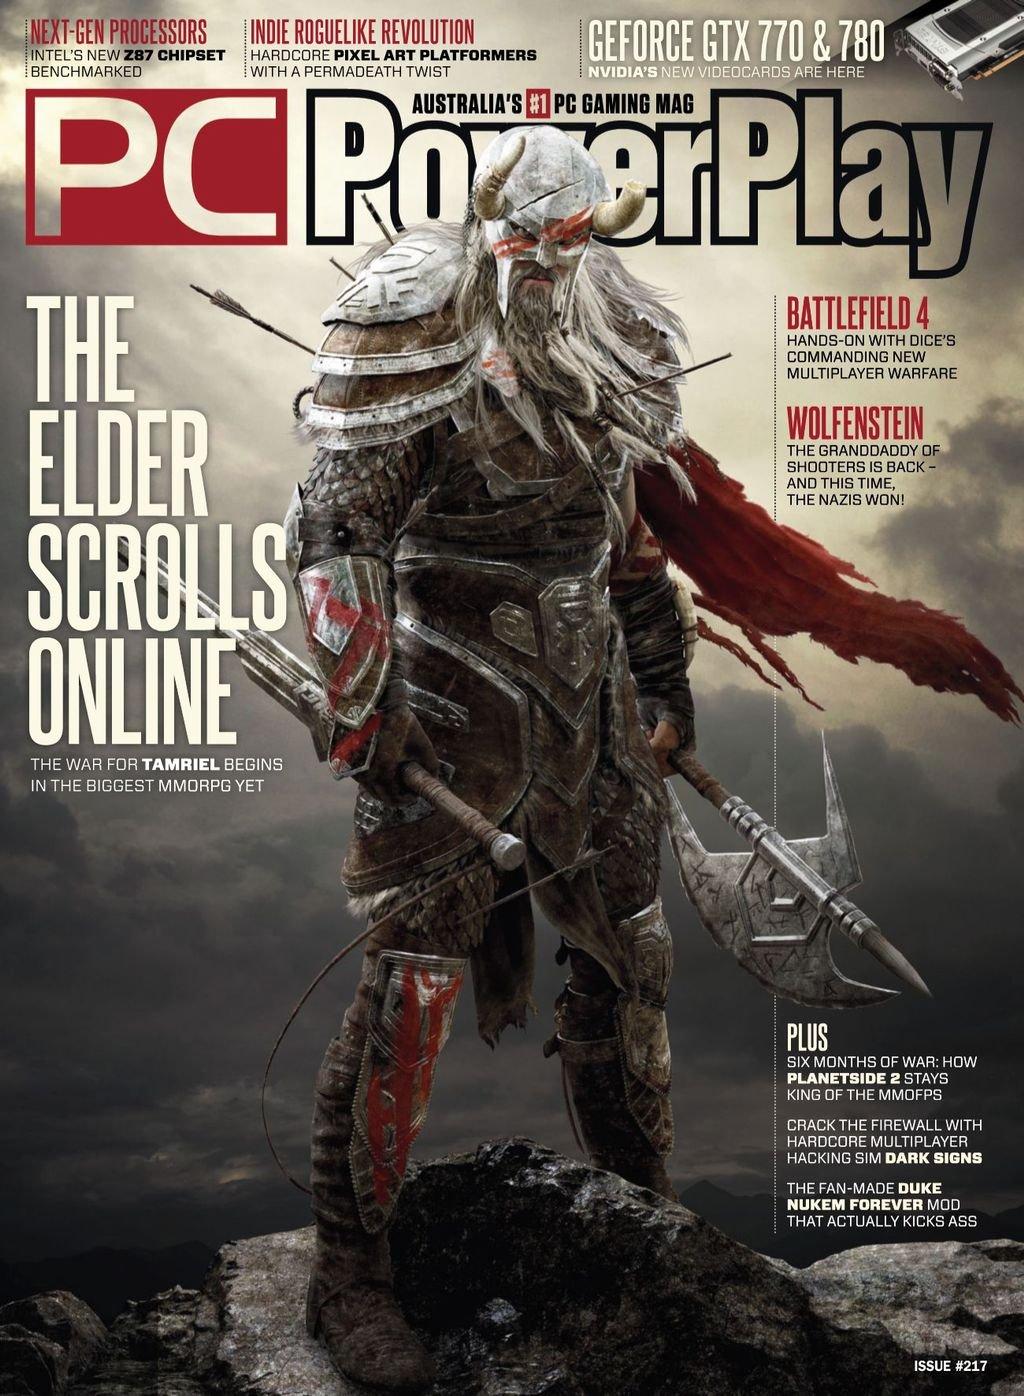 PC Powerplay 217 (July 2013)